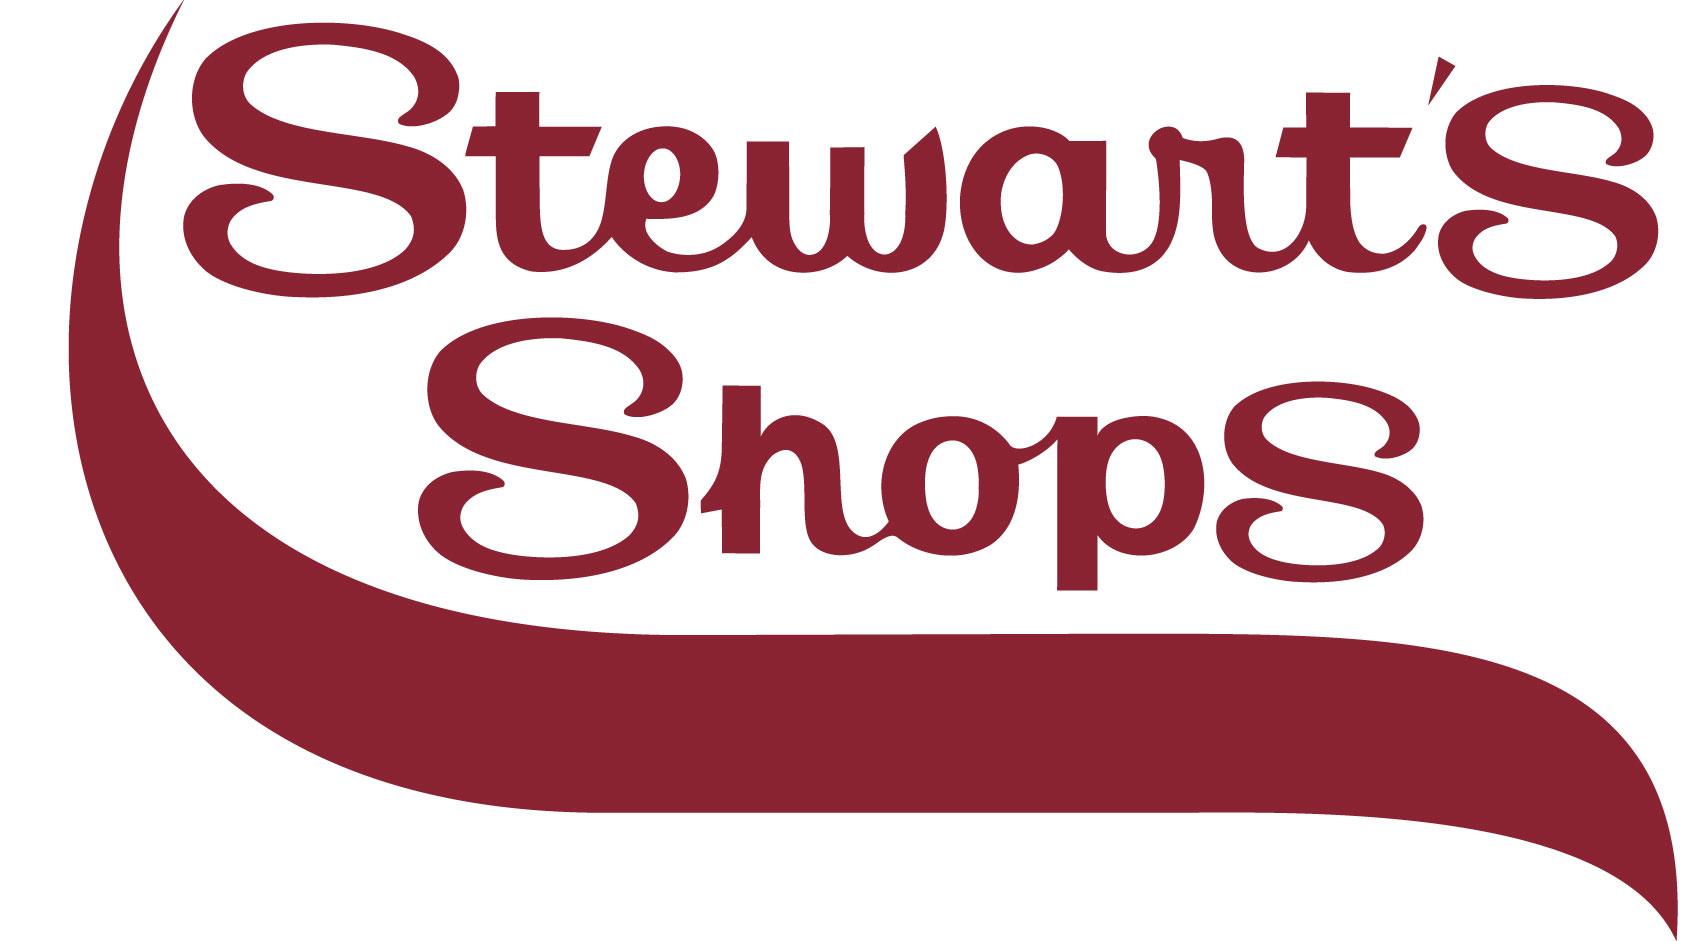 Stewarts_Shops-logo